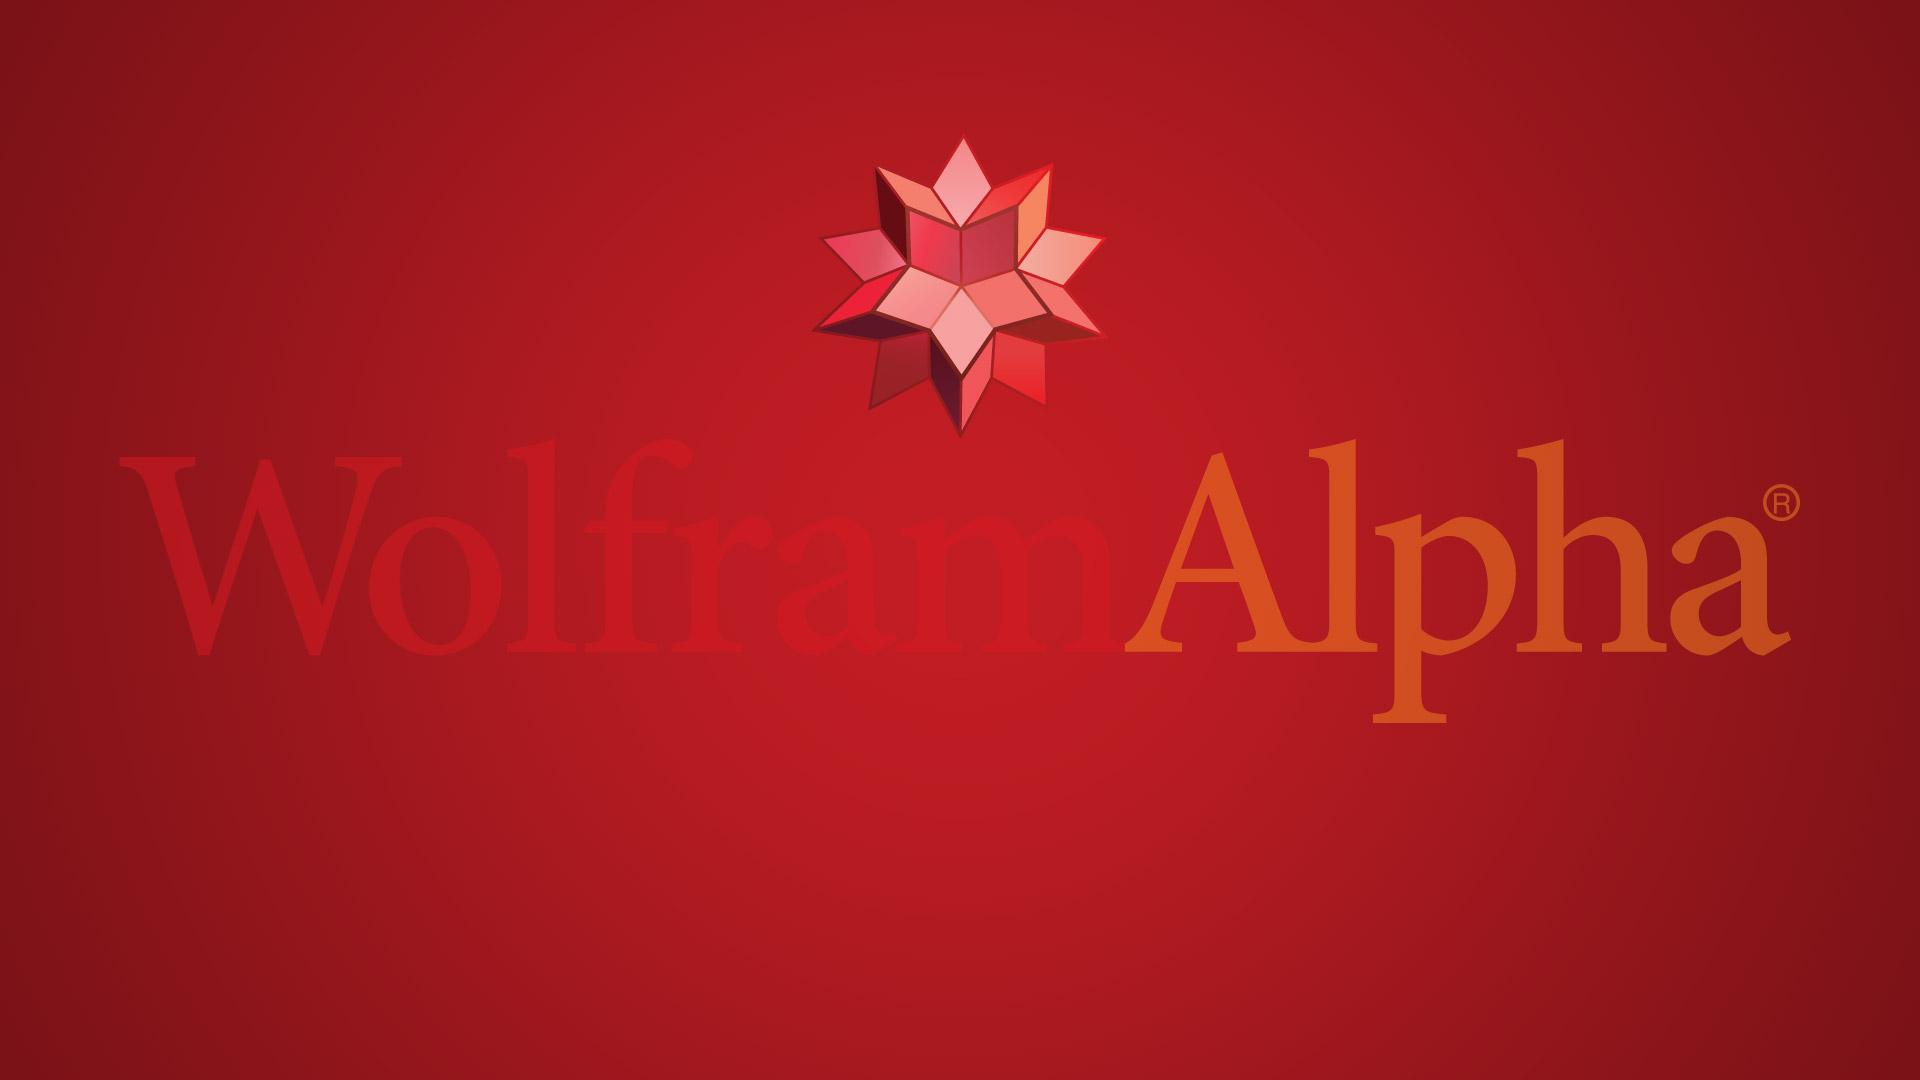 wolfram-alpha-1920